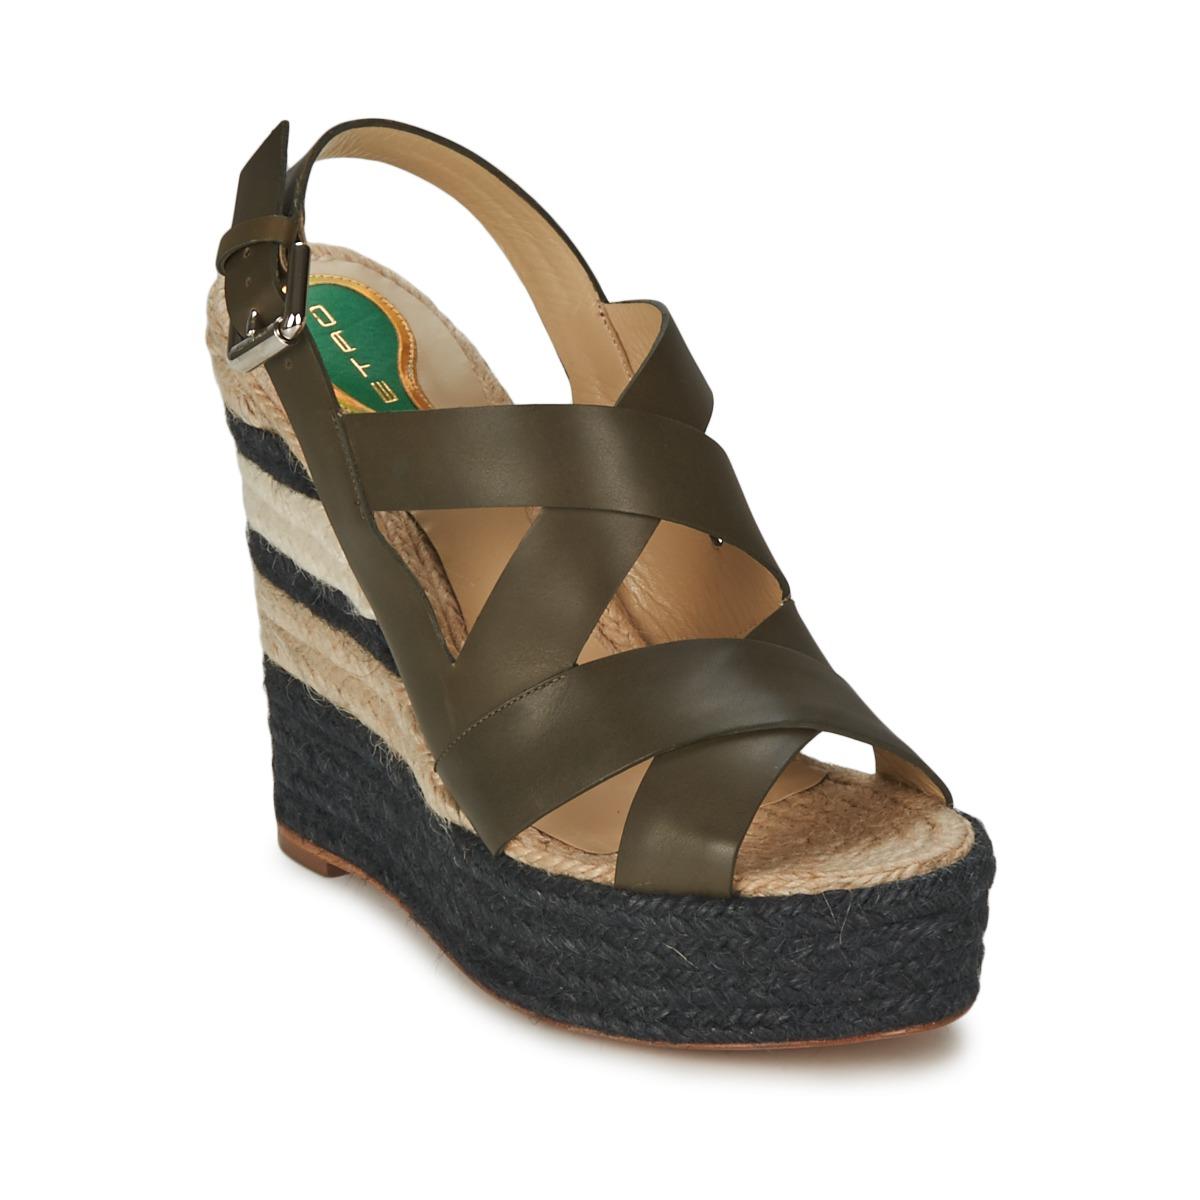 Sandale Etro 3948 Marron